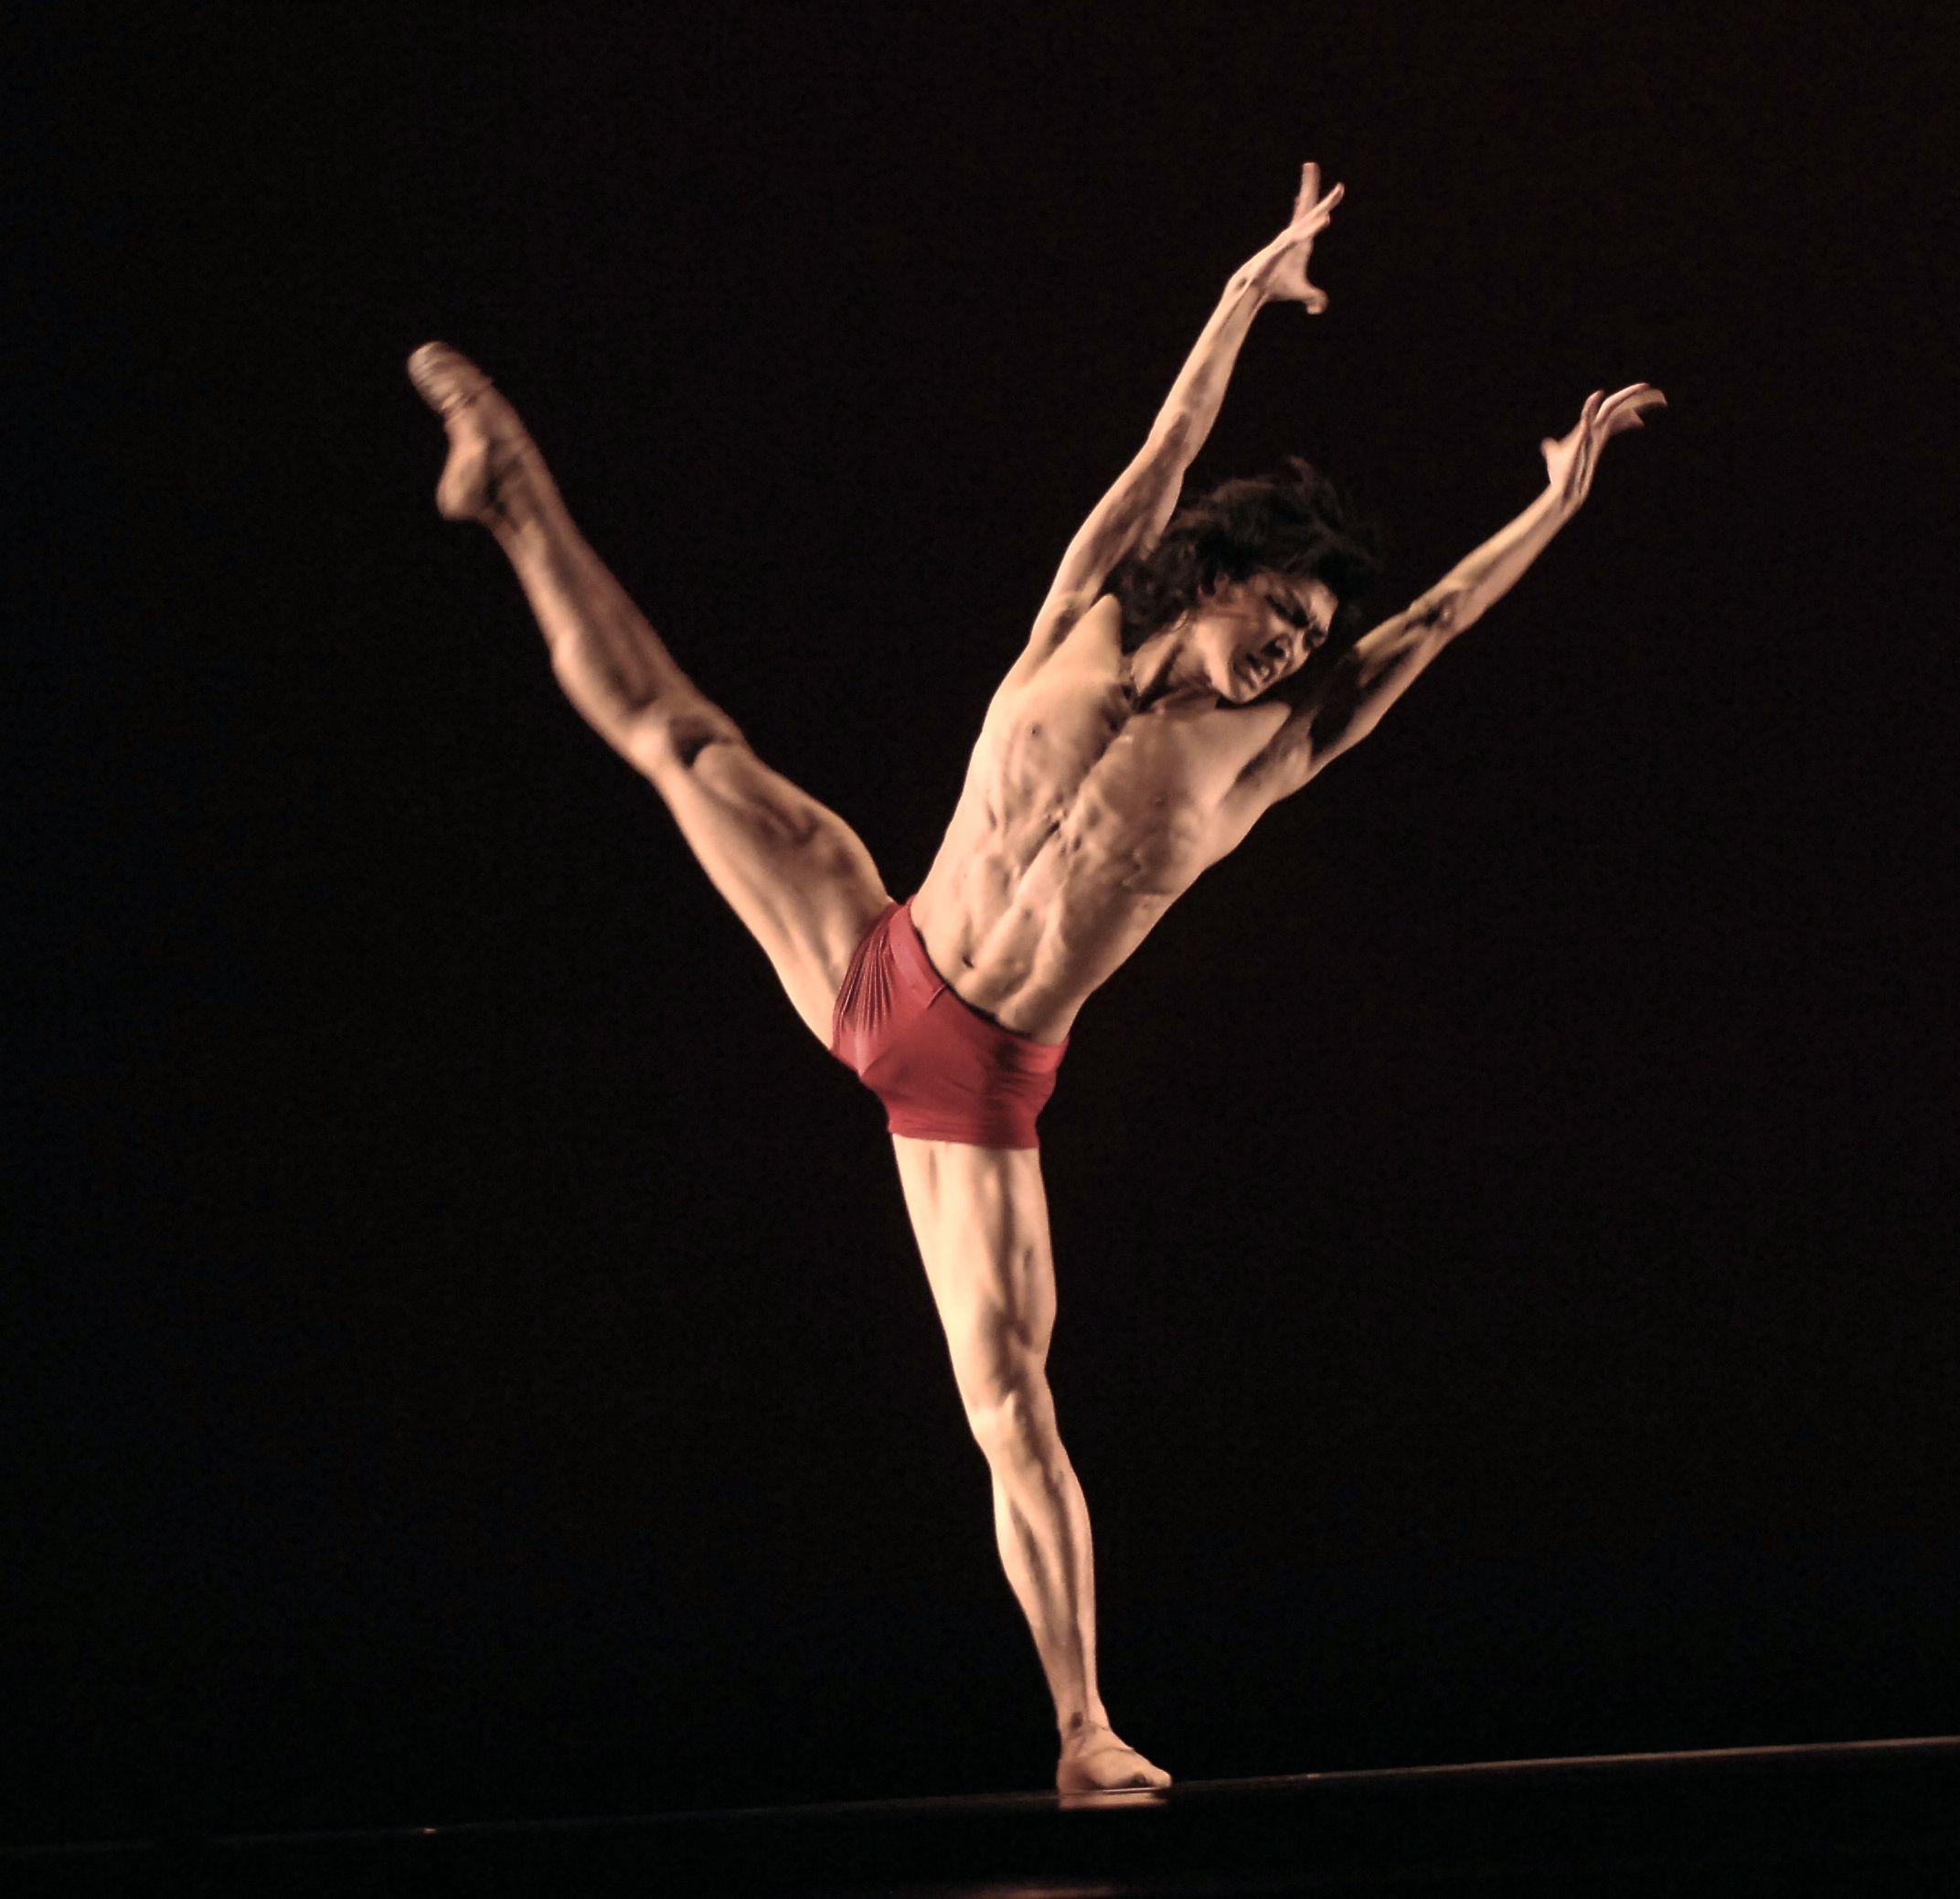 Pin By Barry Junior On Dancers Dancers Body Male Dancer Dance Belt